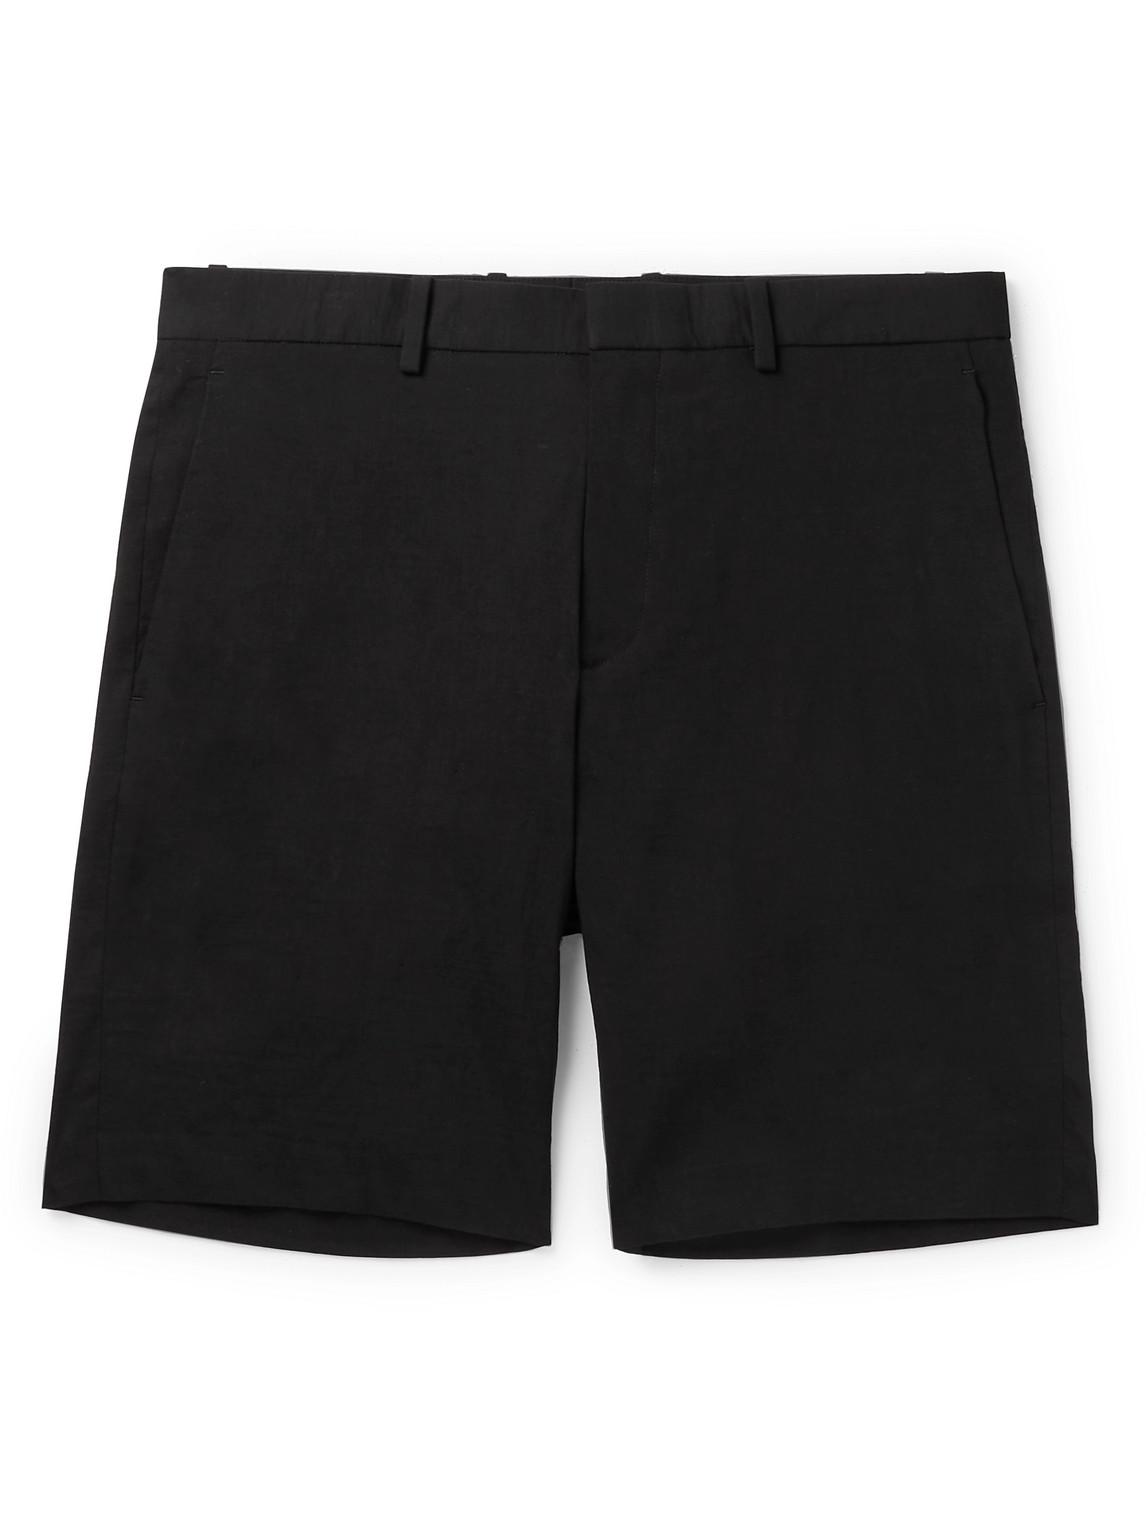 Theory - Curtis Slim-Fit Linen-Blend Shorts - Men - Black - Uk/Us 32